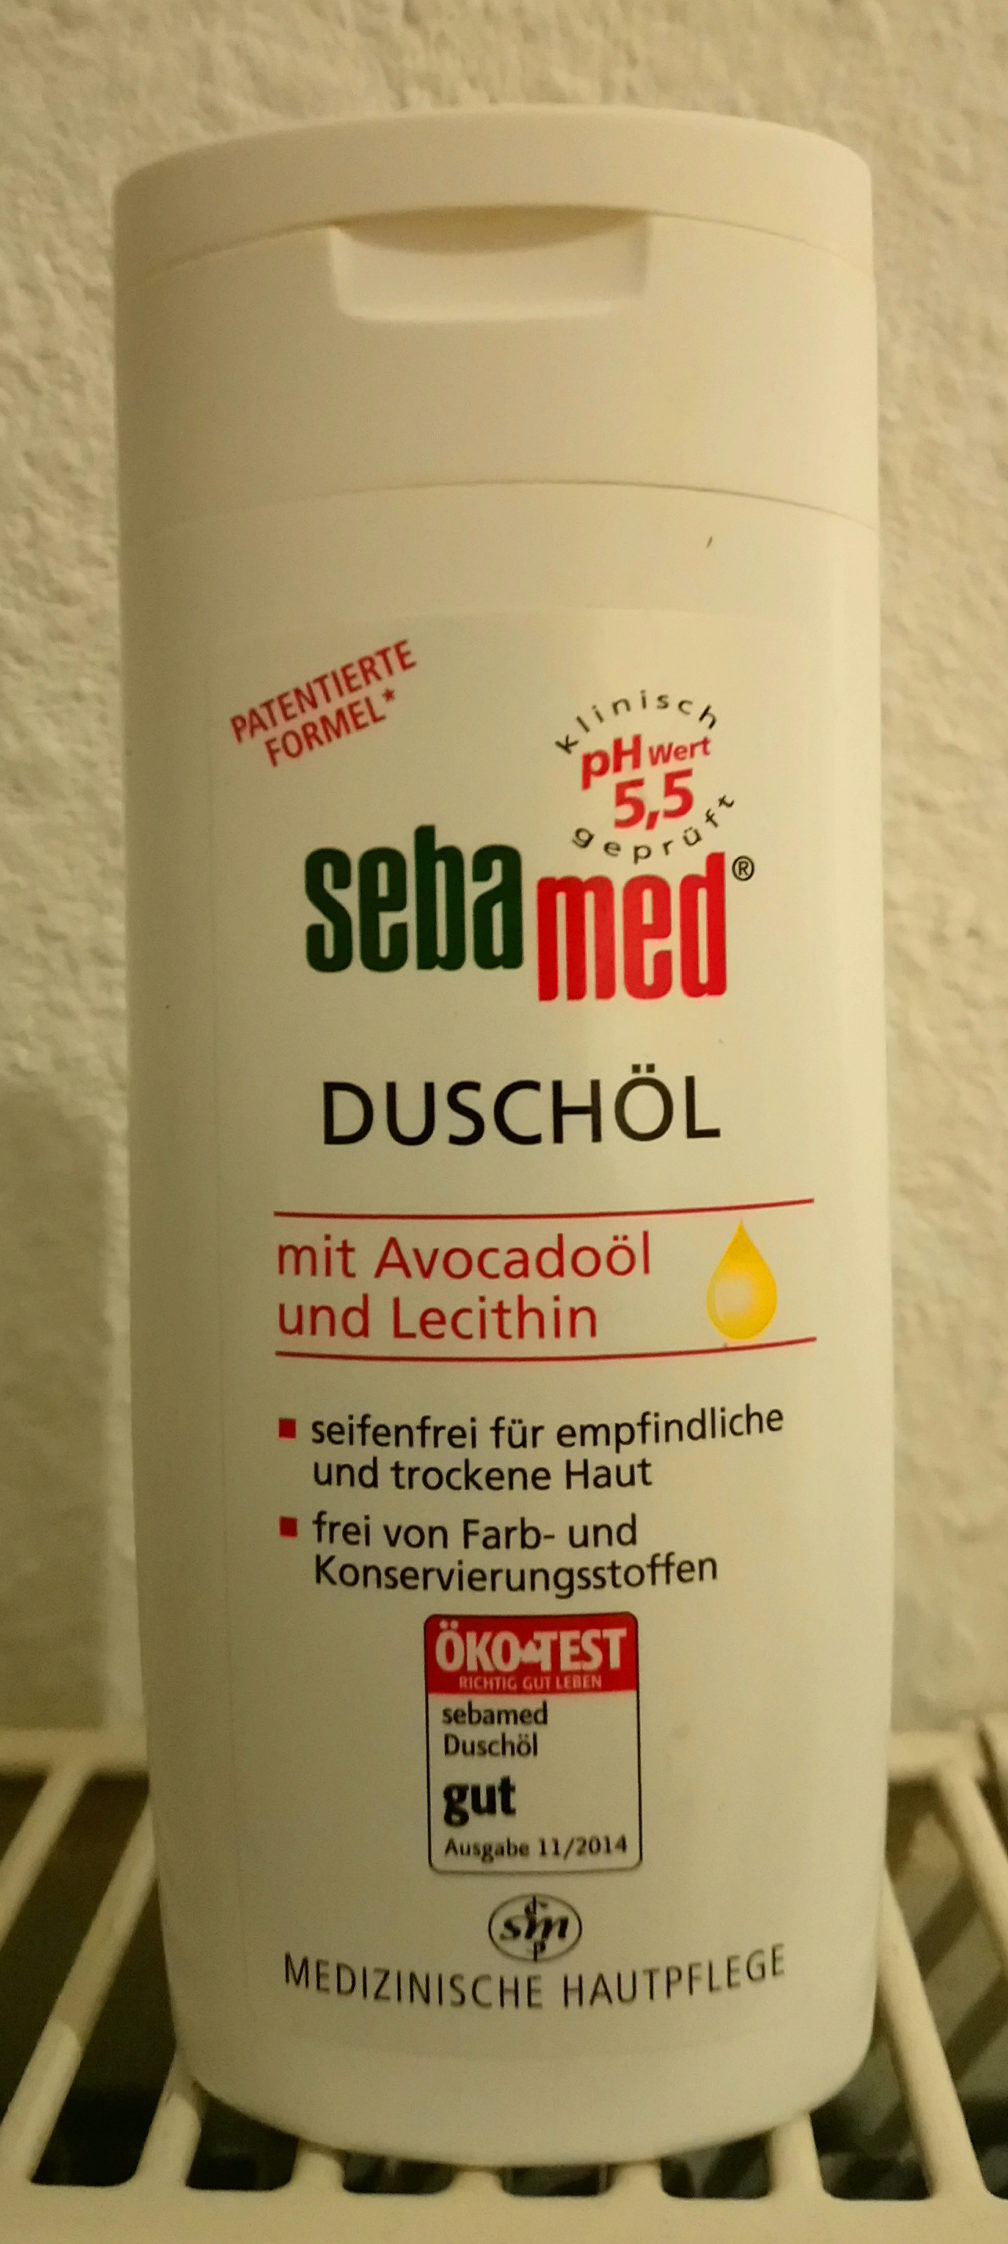 Duschöl mit Avocadoöl und Lecithin - Product - de